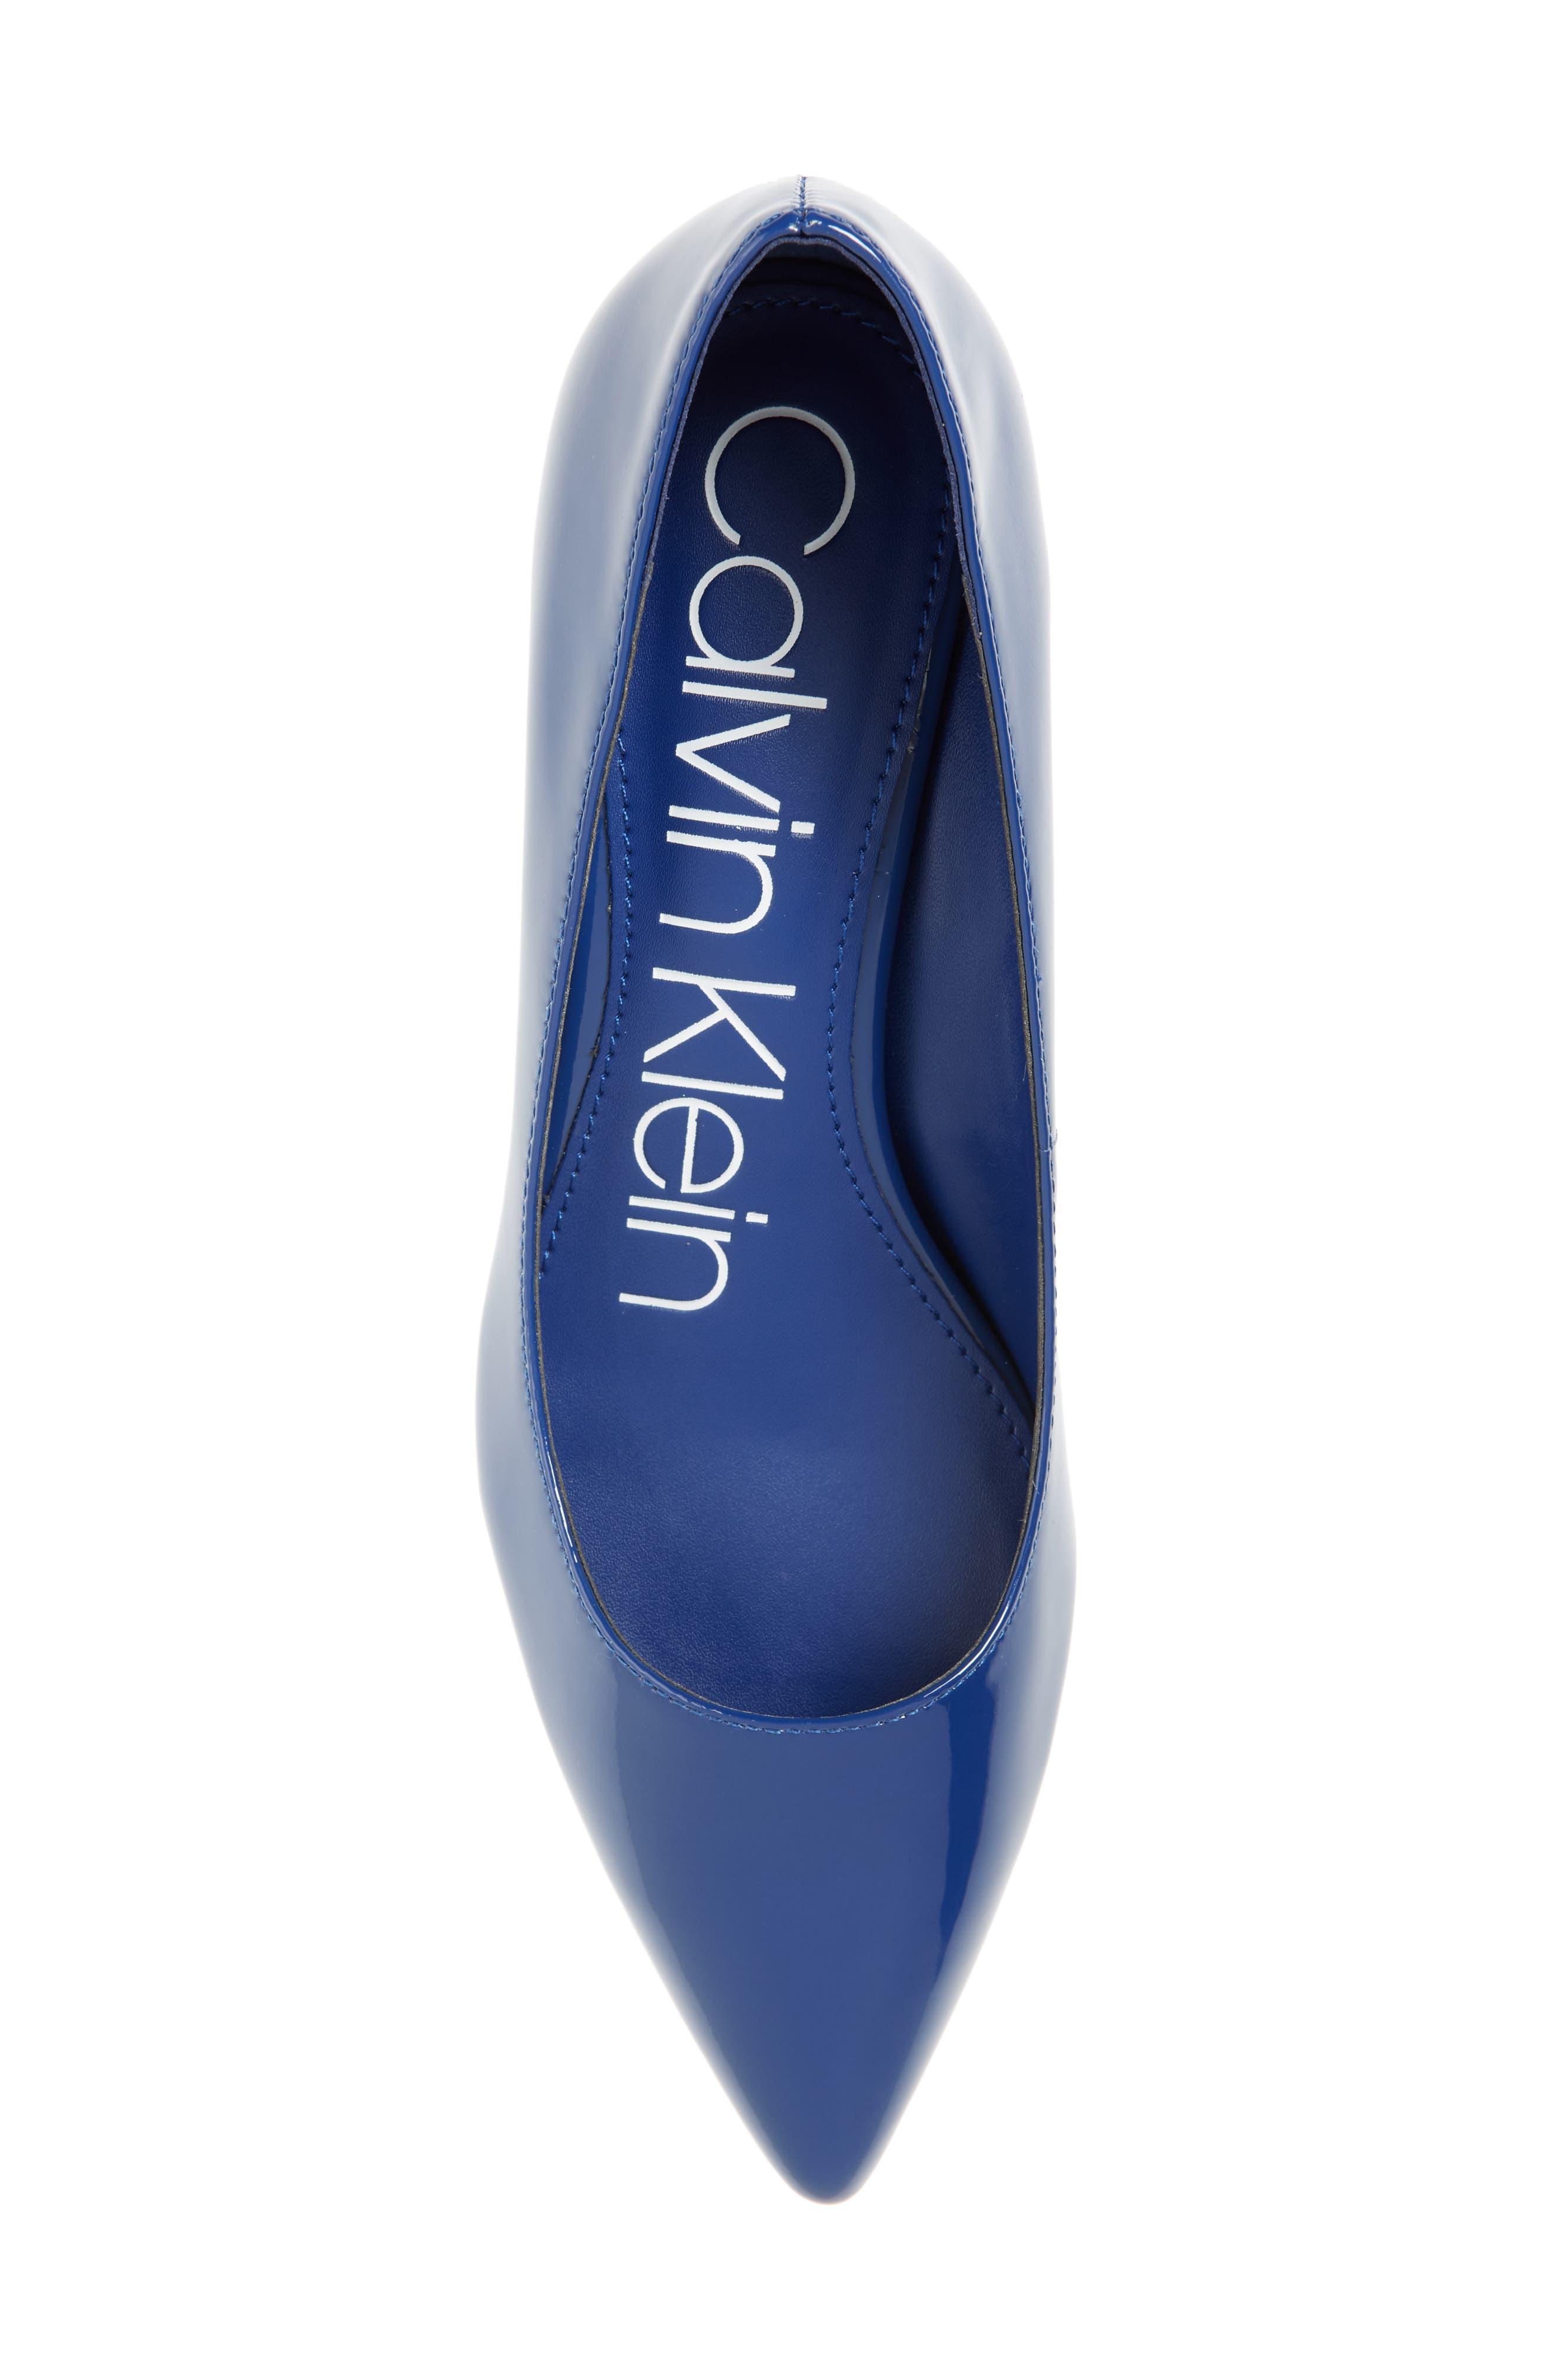 CALVIN KLEIN, Gabrianna Pump, Alternate thumbnail 5, color, ROYAL BLUE PATENT LEATHER